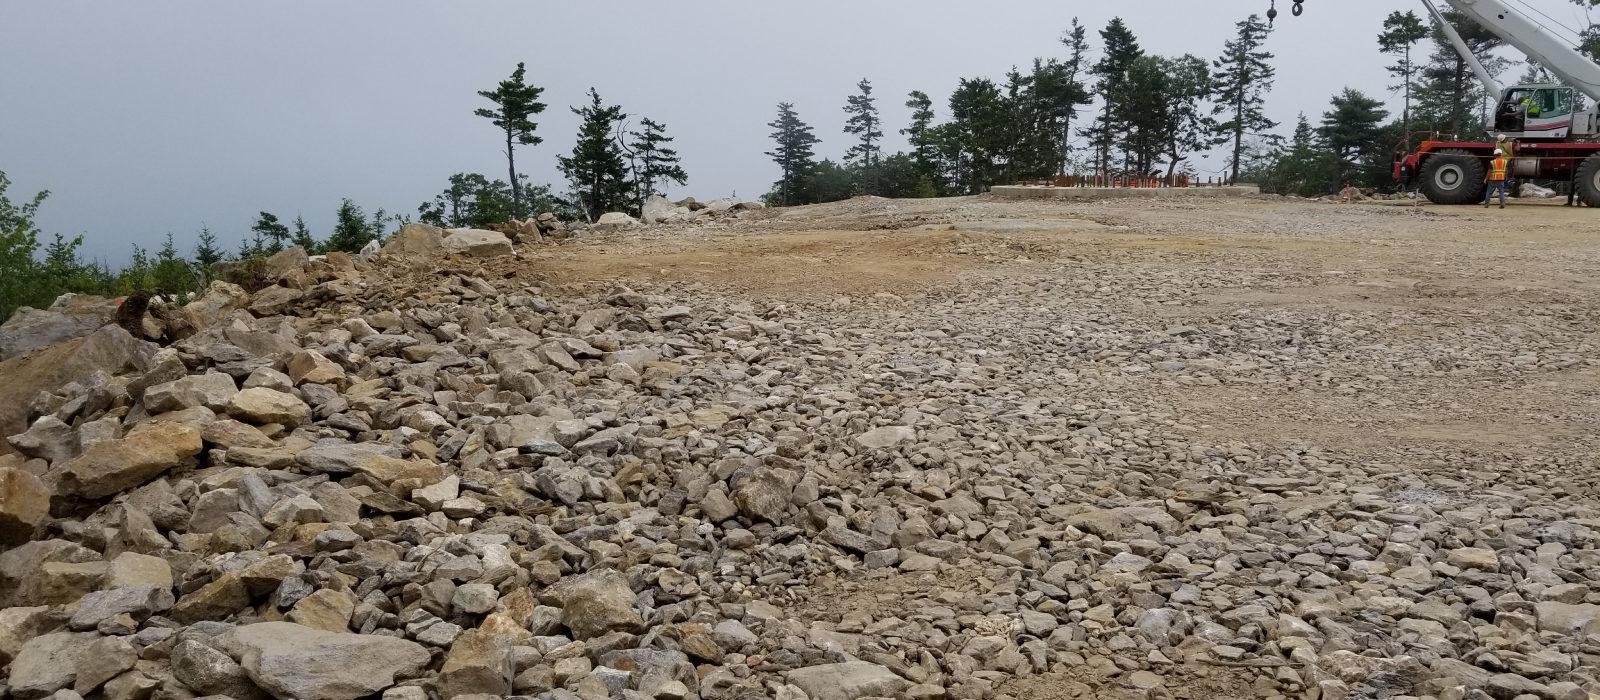 Rock Cliff At Wind Farm Sitework